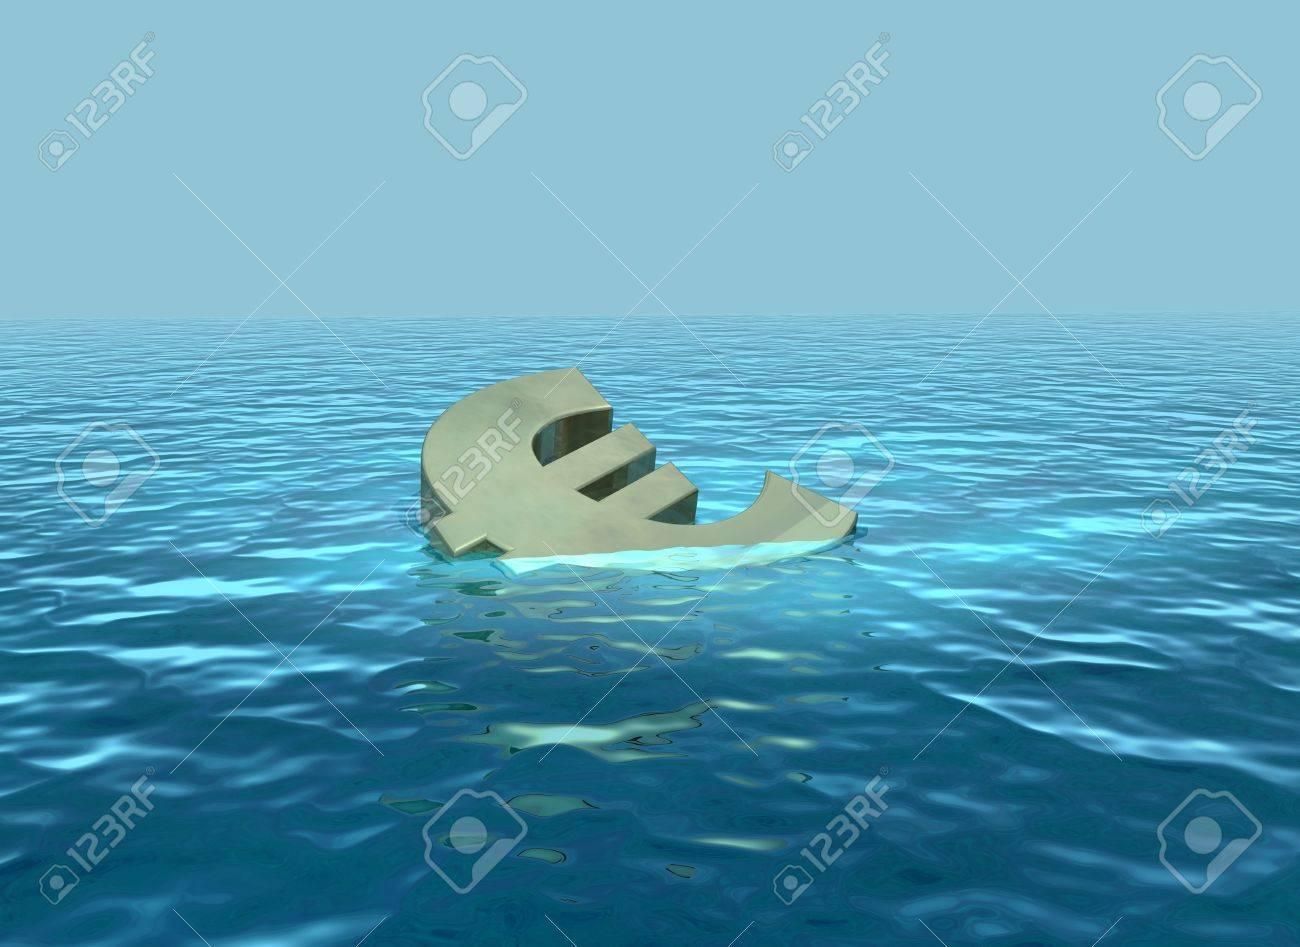 The euro sinking or struggling economy Stock Photo - 13532683